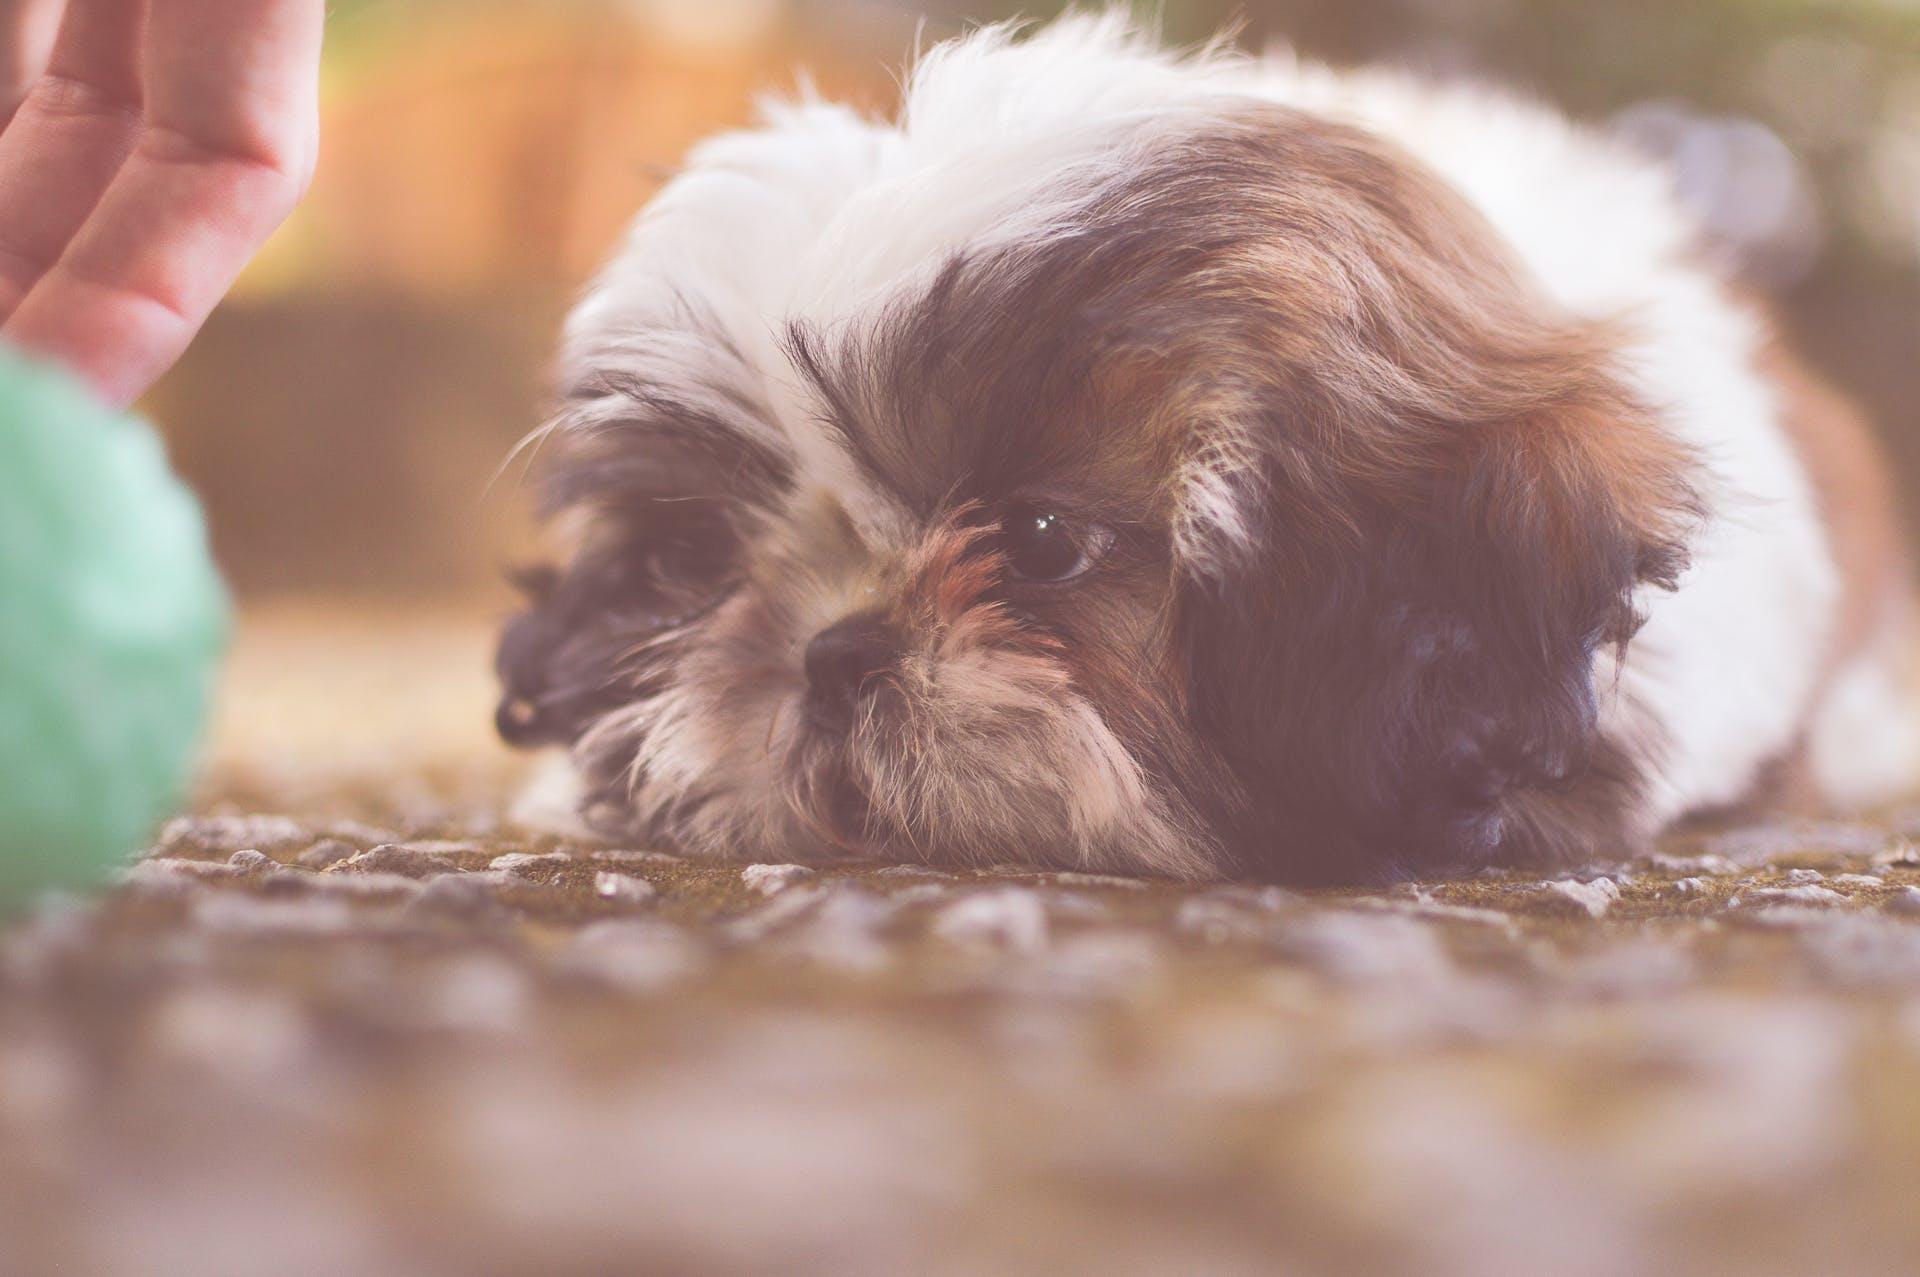 animal, blur, canine